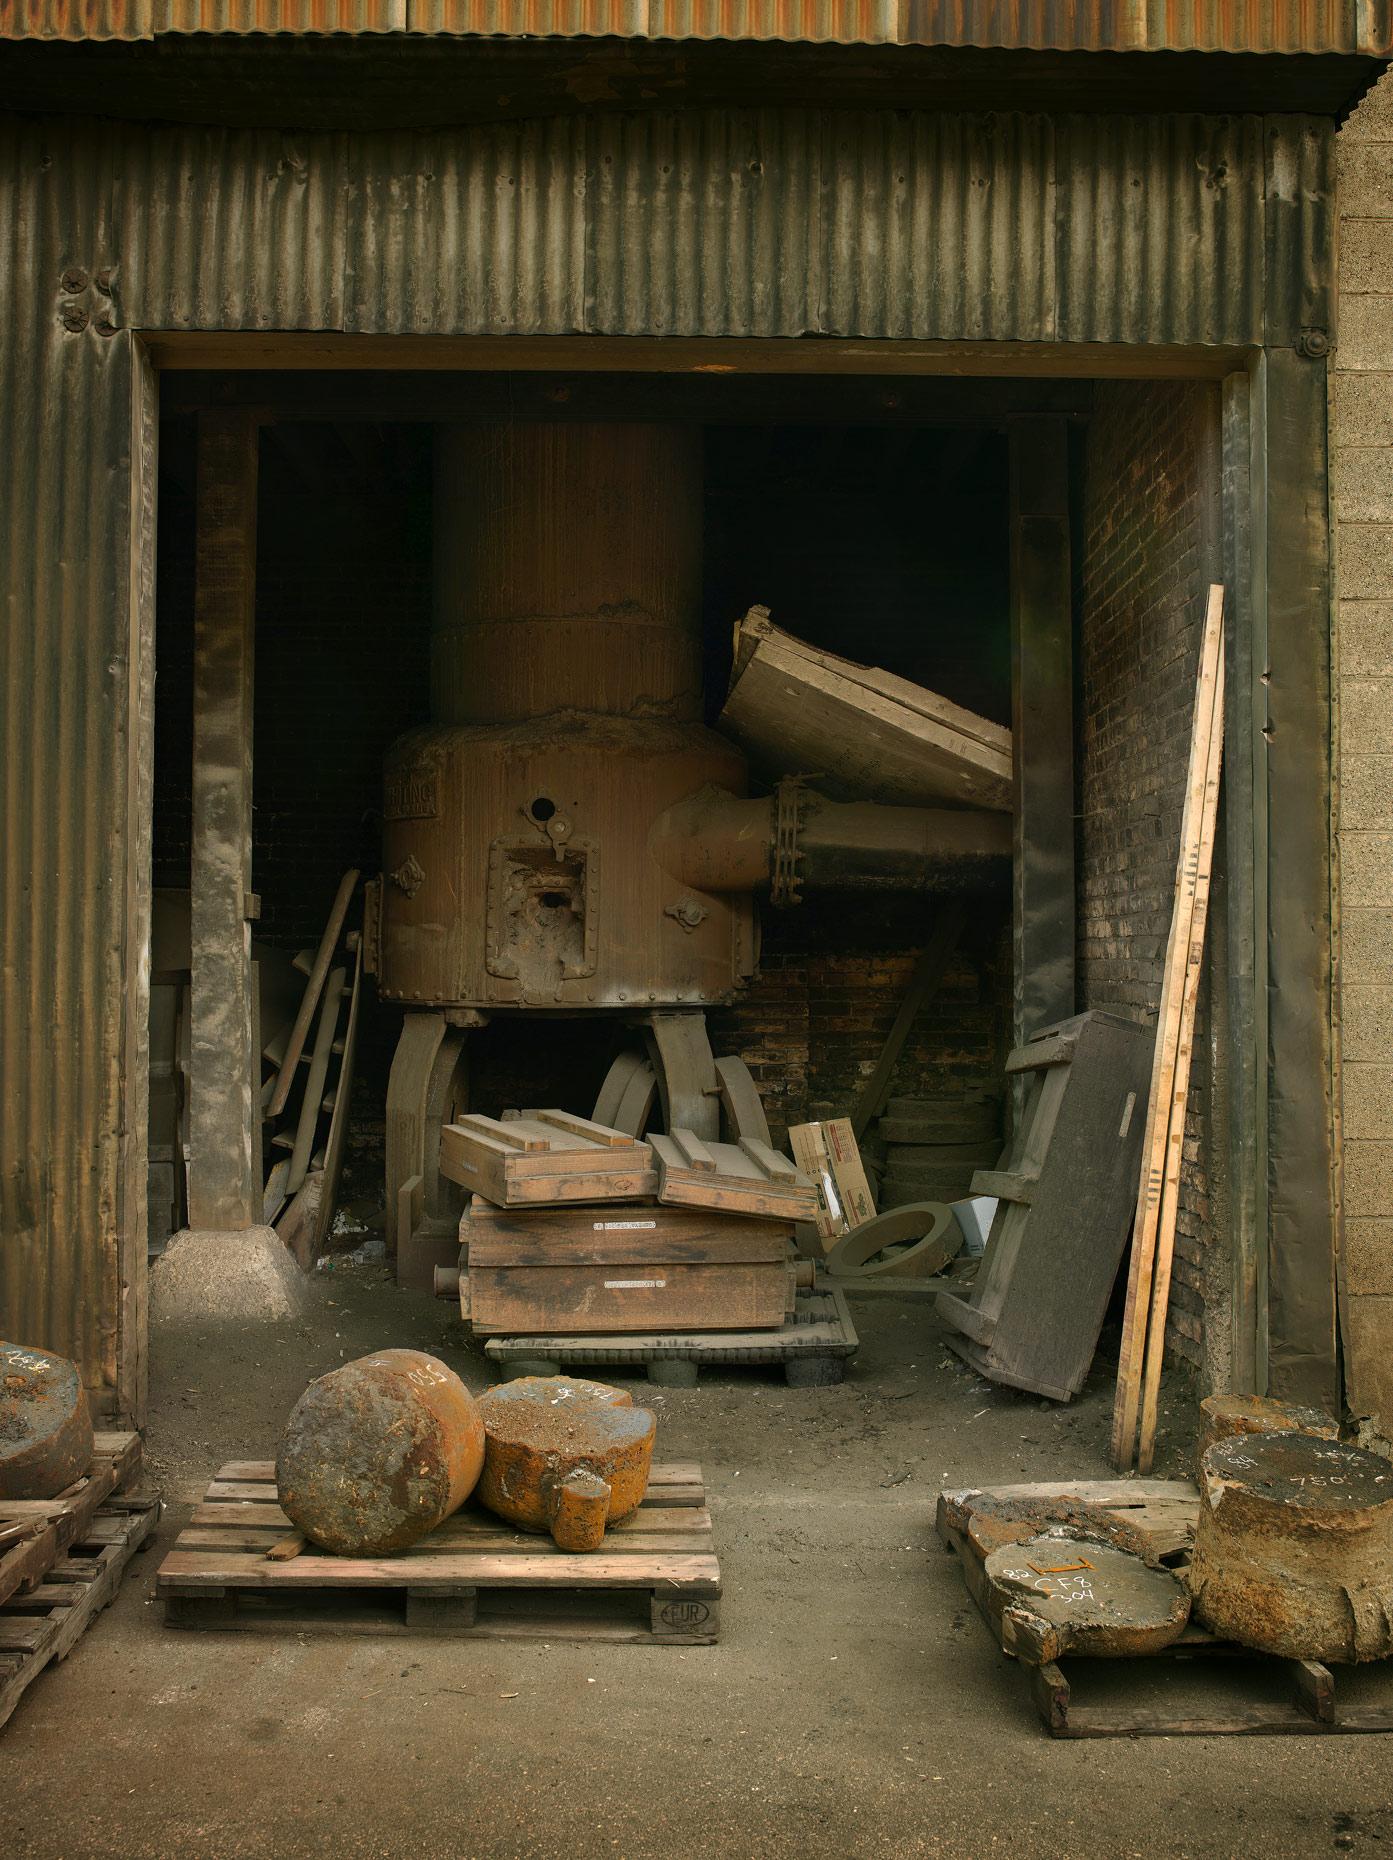 Projects-Editorial-Photography-Derek-Israelsen-013-Rust_Pallets.jpg